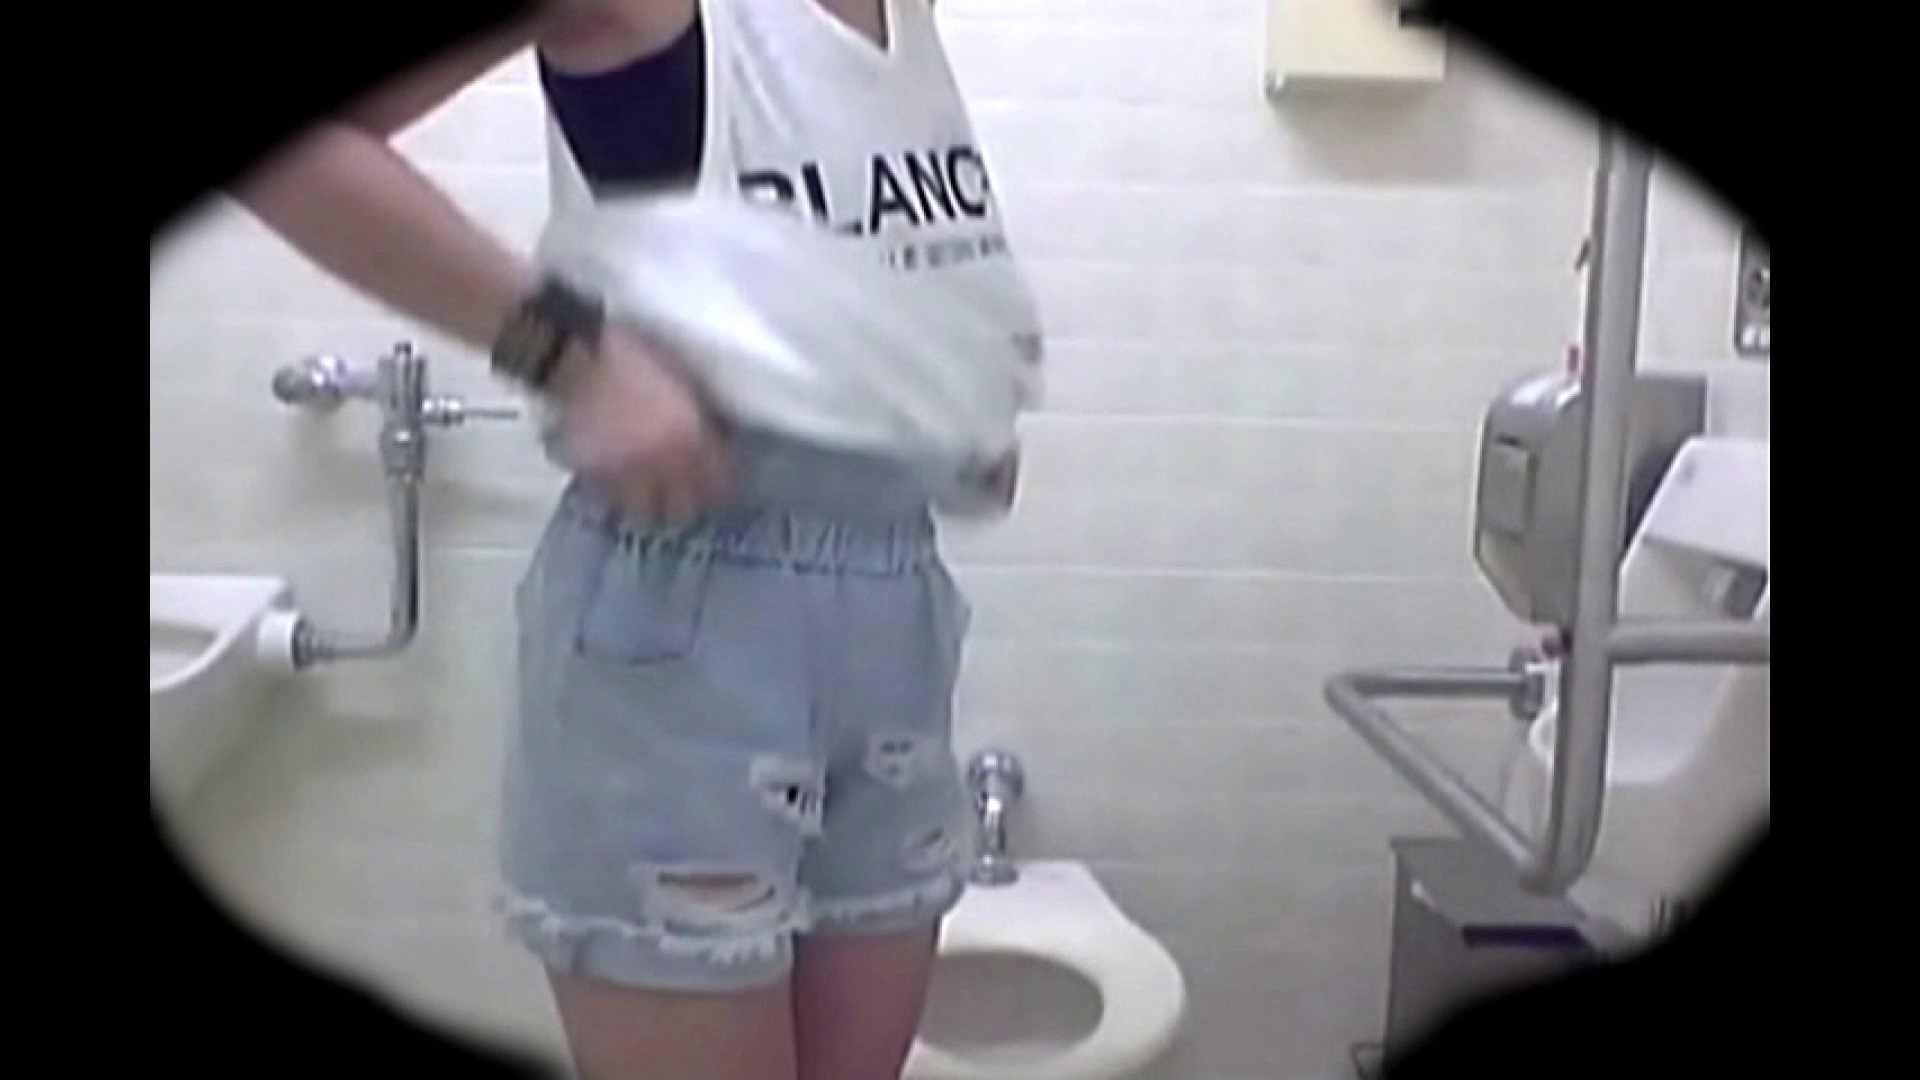 teen galトイレ覗き紙がナイ編‼vol.06 OLのエロ生活  82連発 80